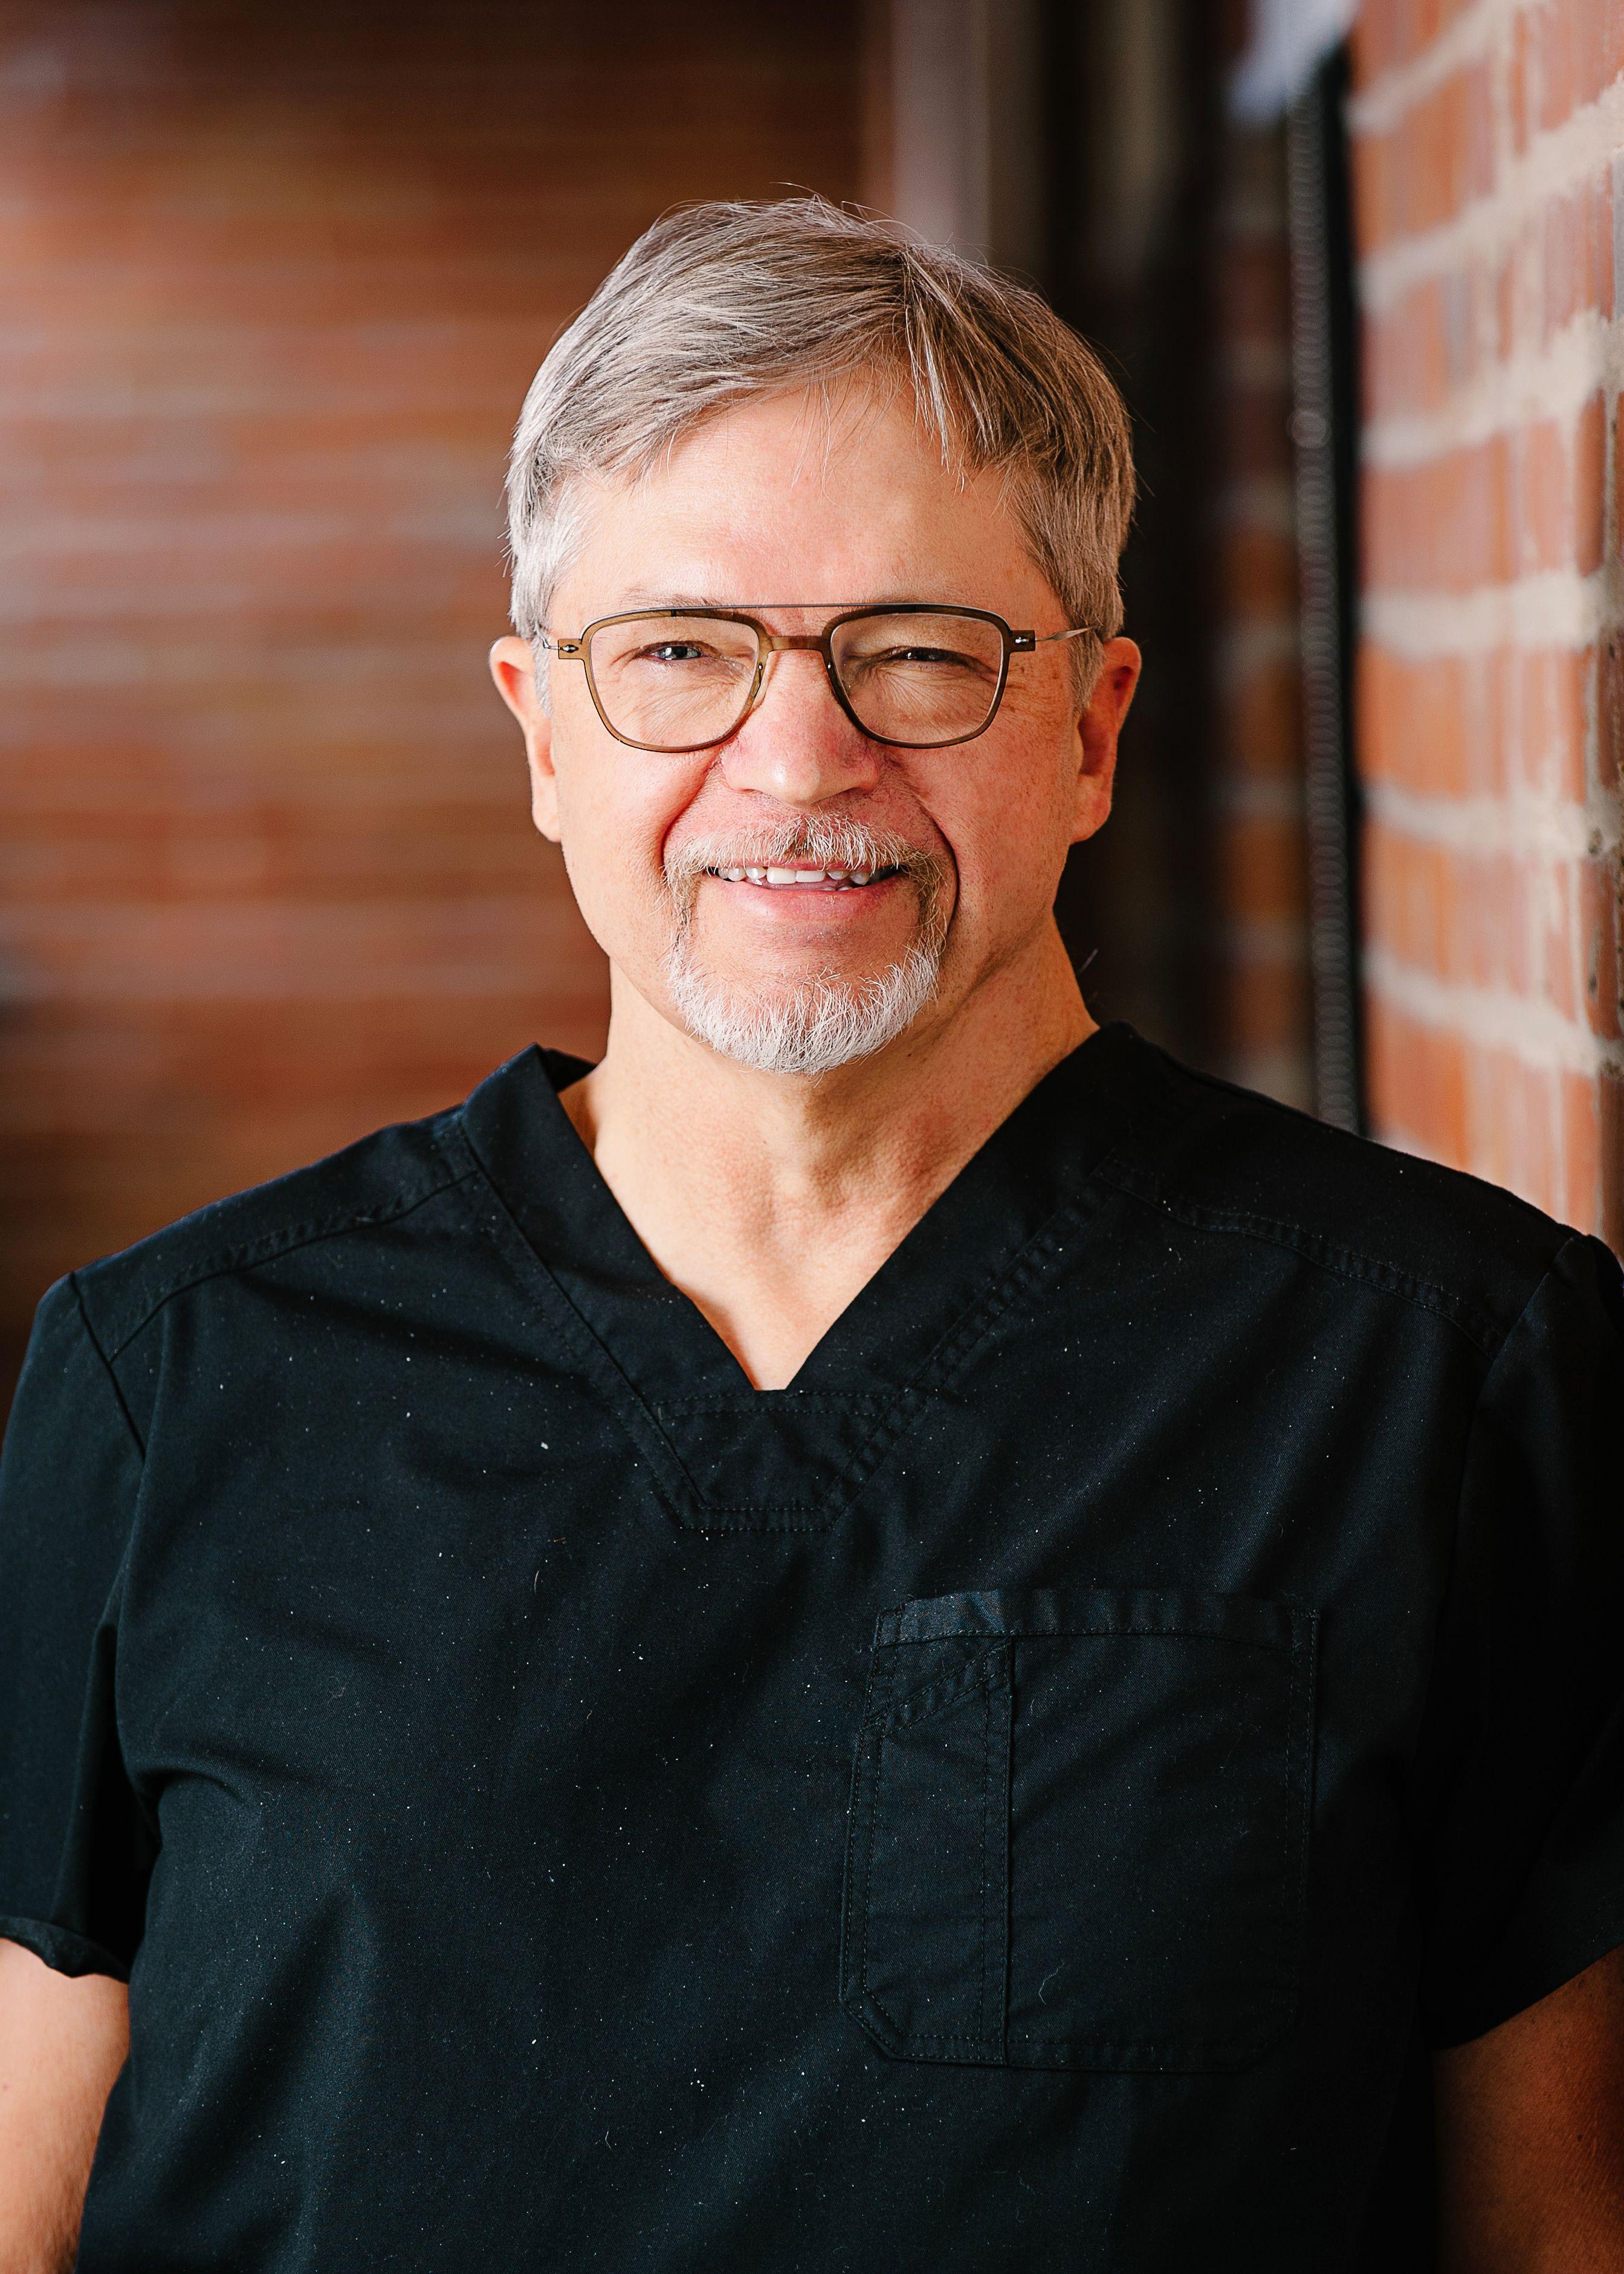 Dr. Kevin Stingley